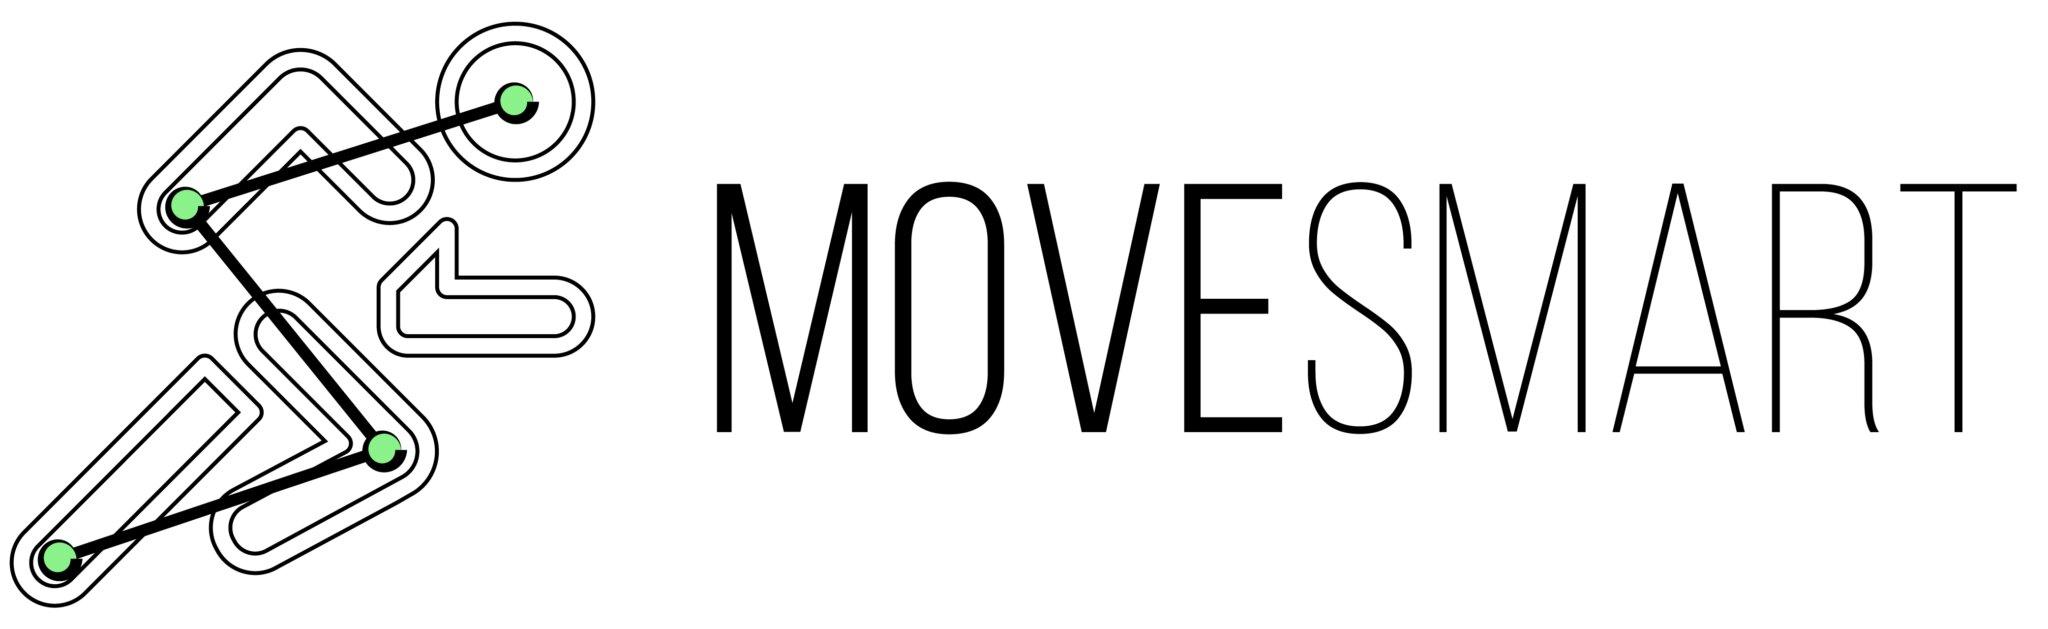 Movesmart | Personal Training Amsterdam